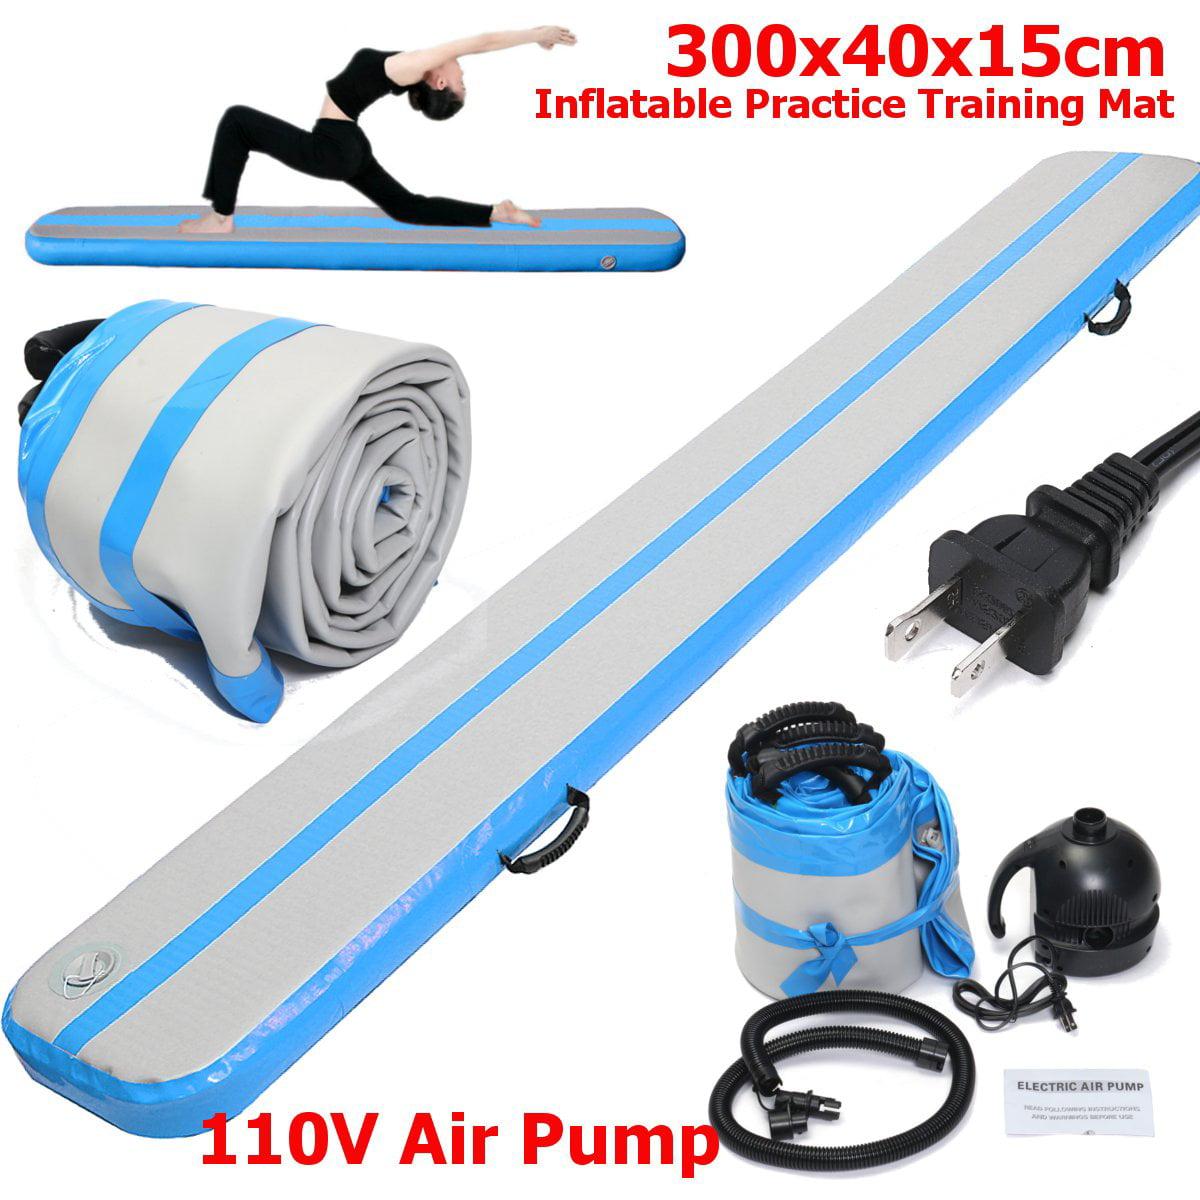 9.8ft x 1.3ft x 0.5ft Blue&Grey Gymnastics Air Balance Beam Inflatable Practice Training GYM Yoga Mat Air Tumbling Floor Home Track+ 110V Pump